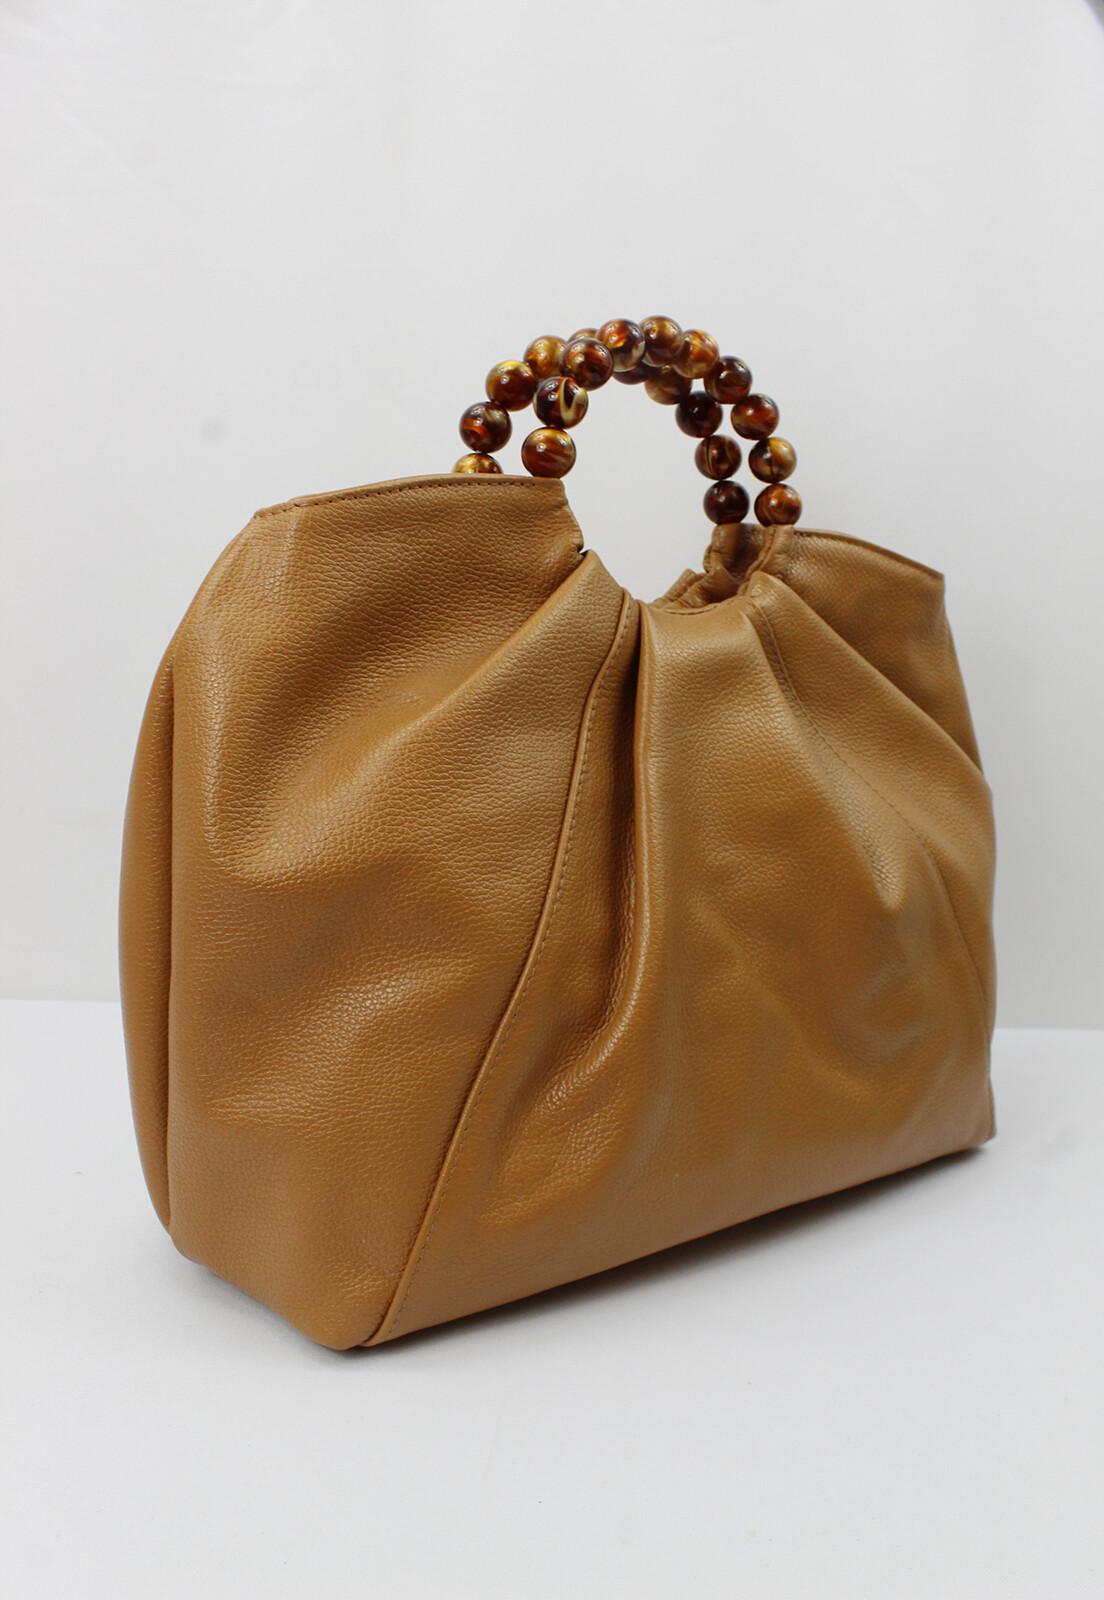 Bolsa Crisfael Couro